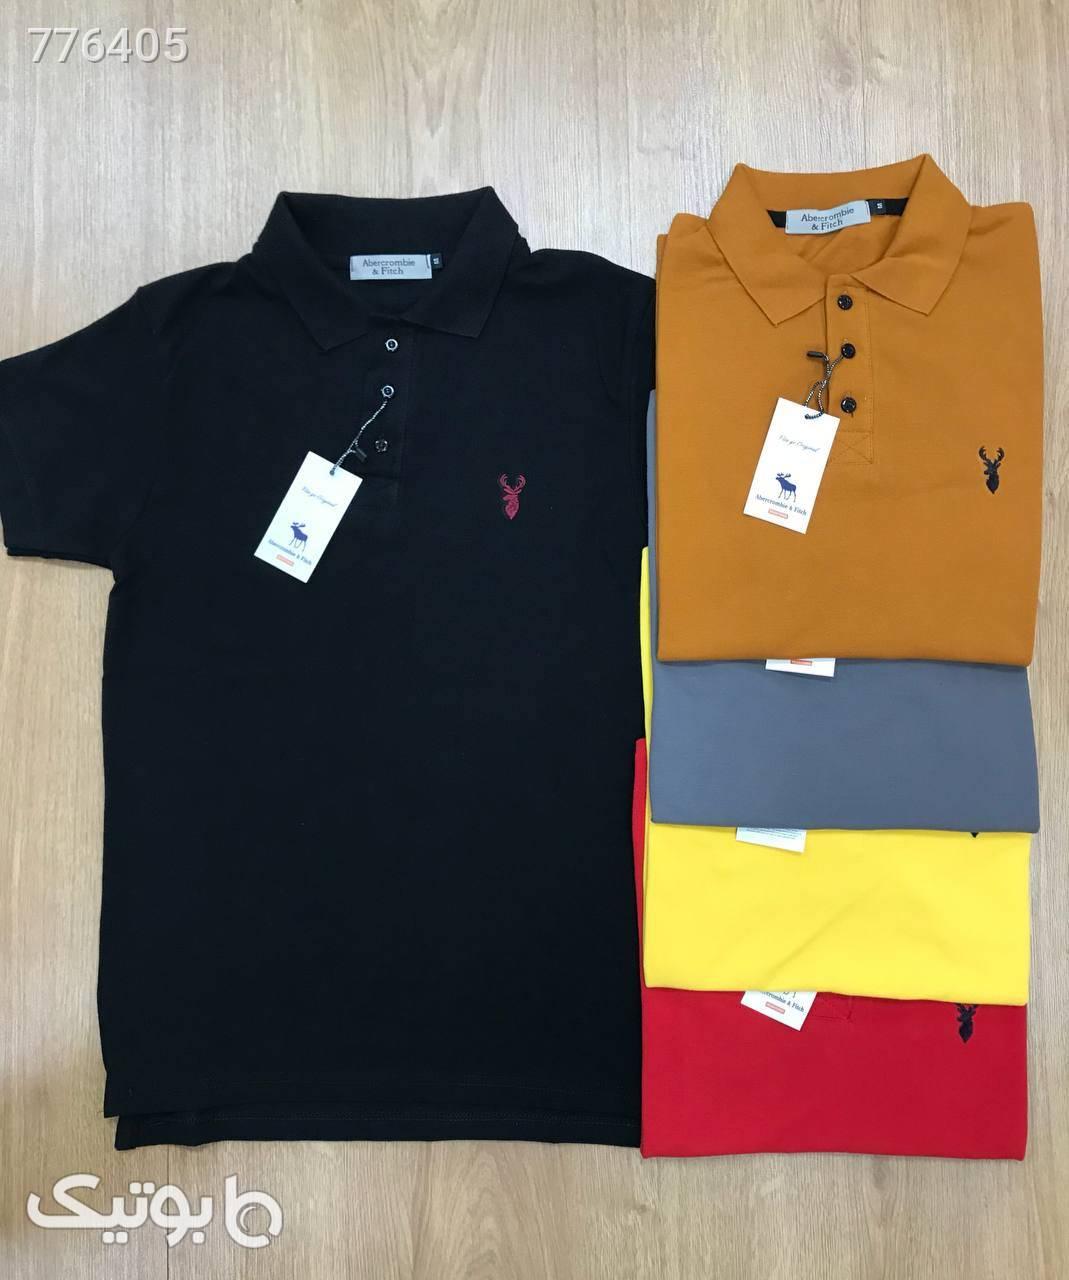 تیشرت مردانه زرد تی شرت و پولو شرت مردانه